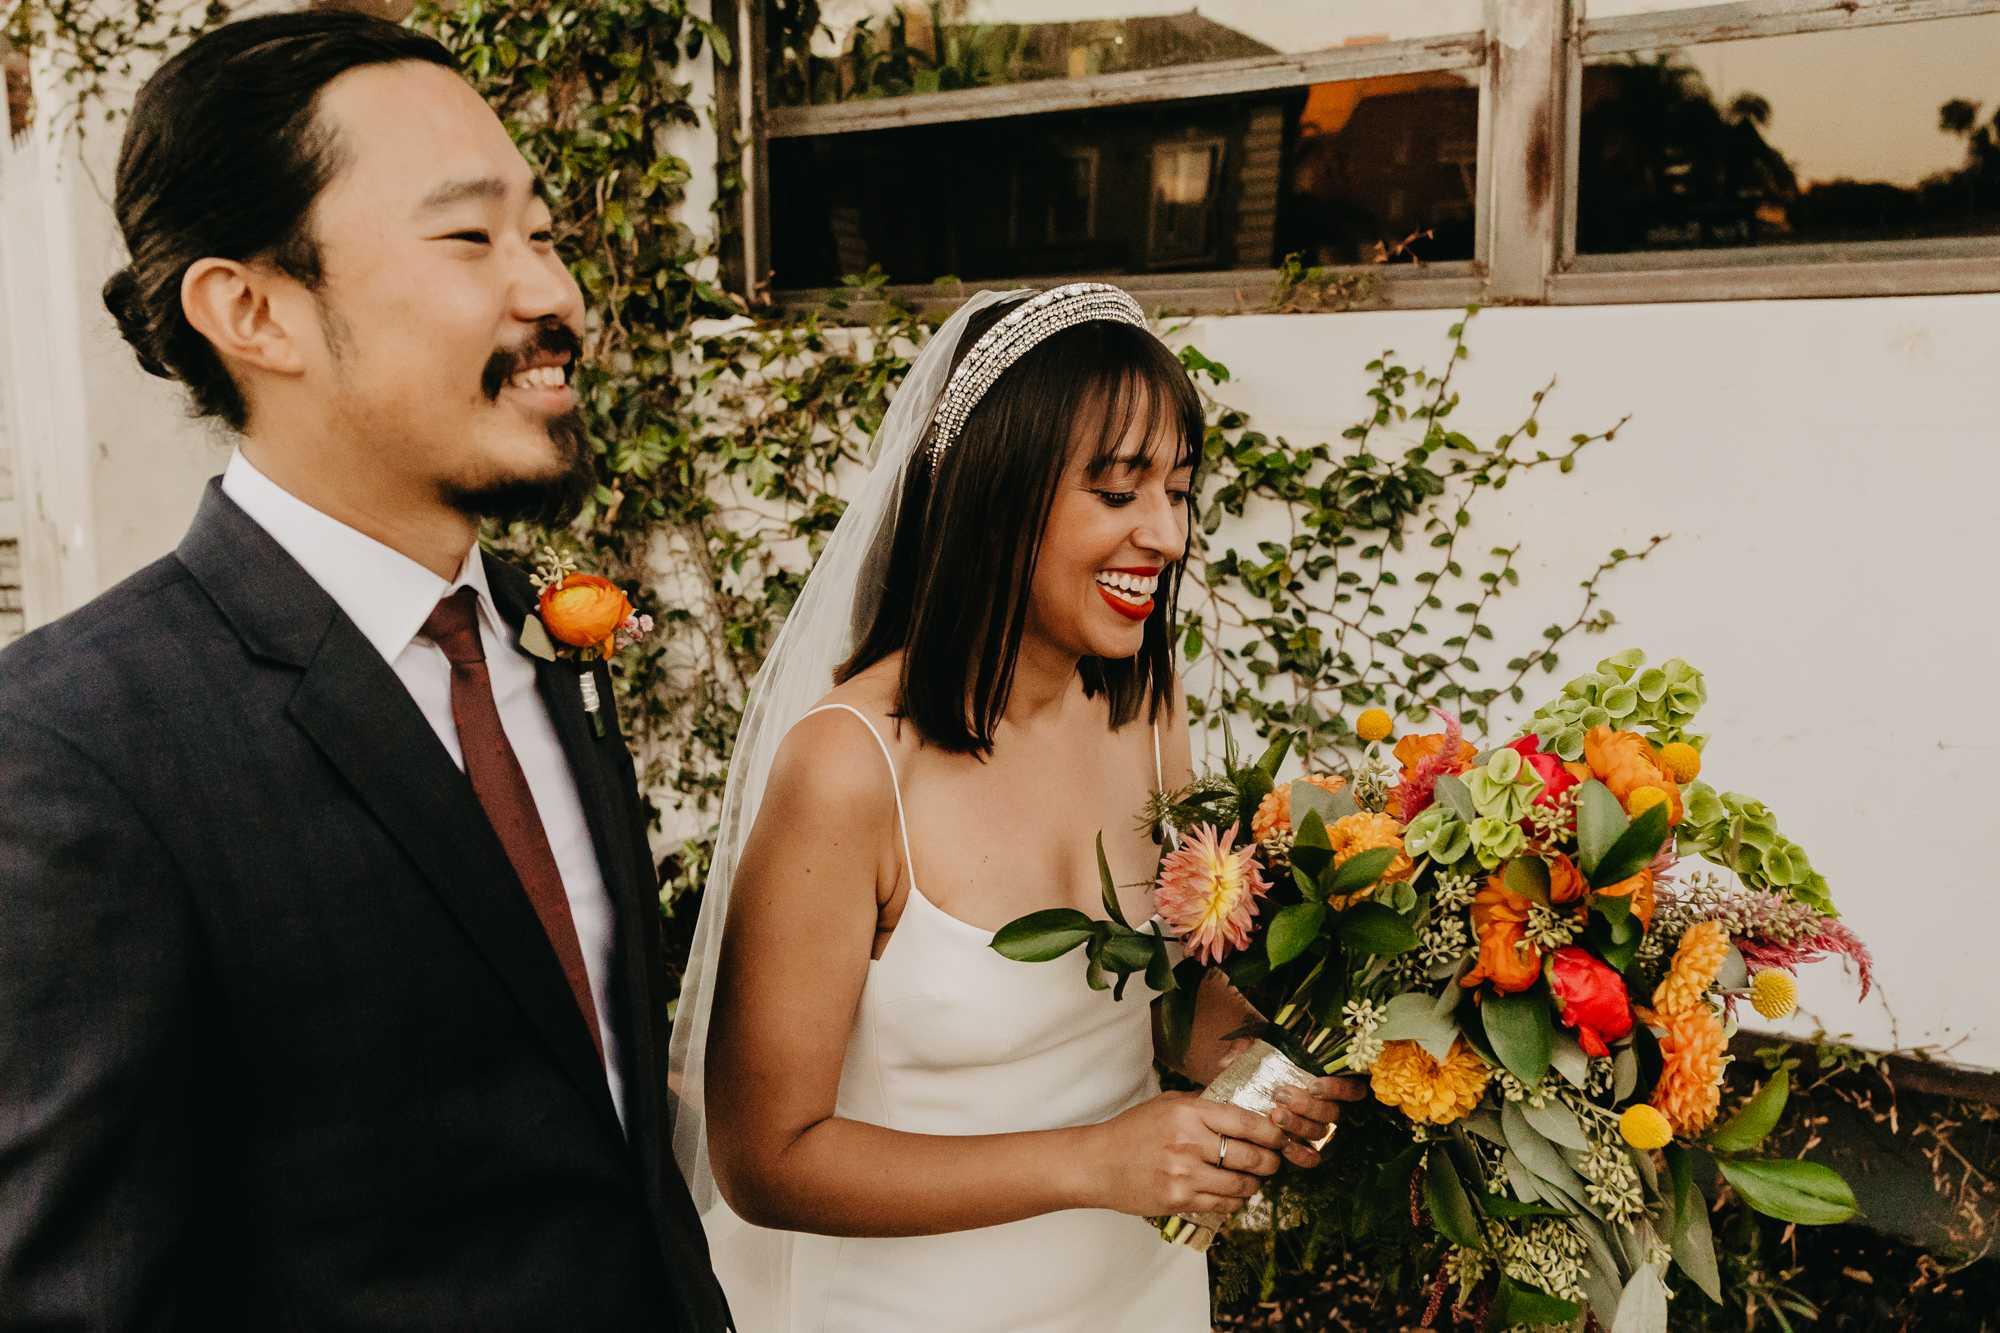 Los Angeles, Hollywood, wedding, Madera kitchen, la, dtla, hot, couple, Nyc couple, destination wedding